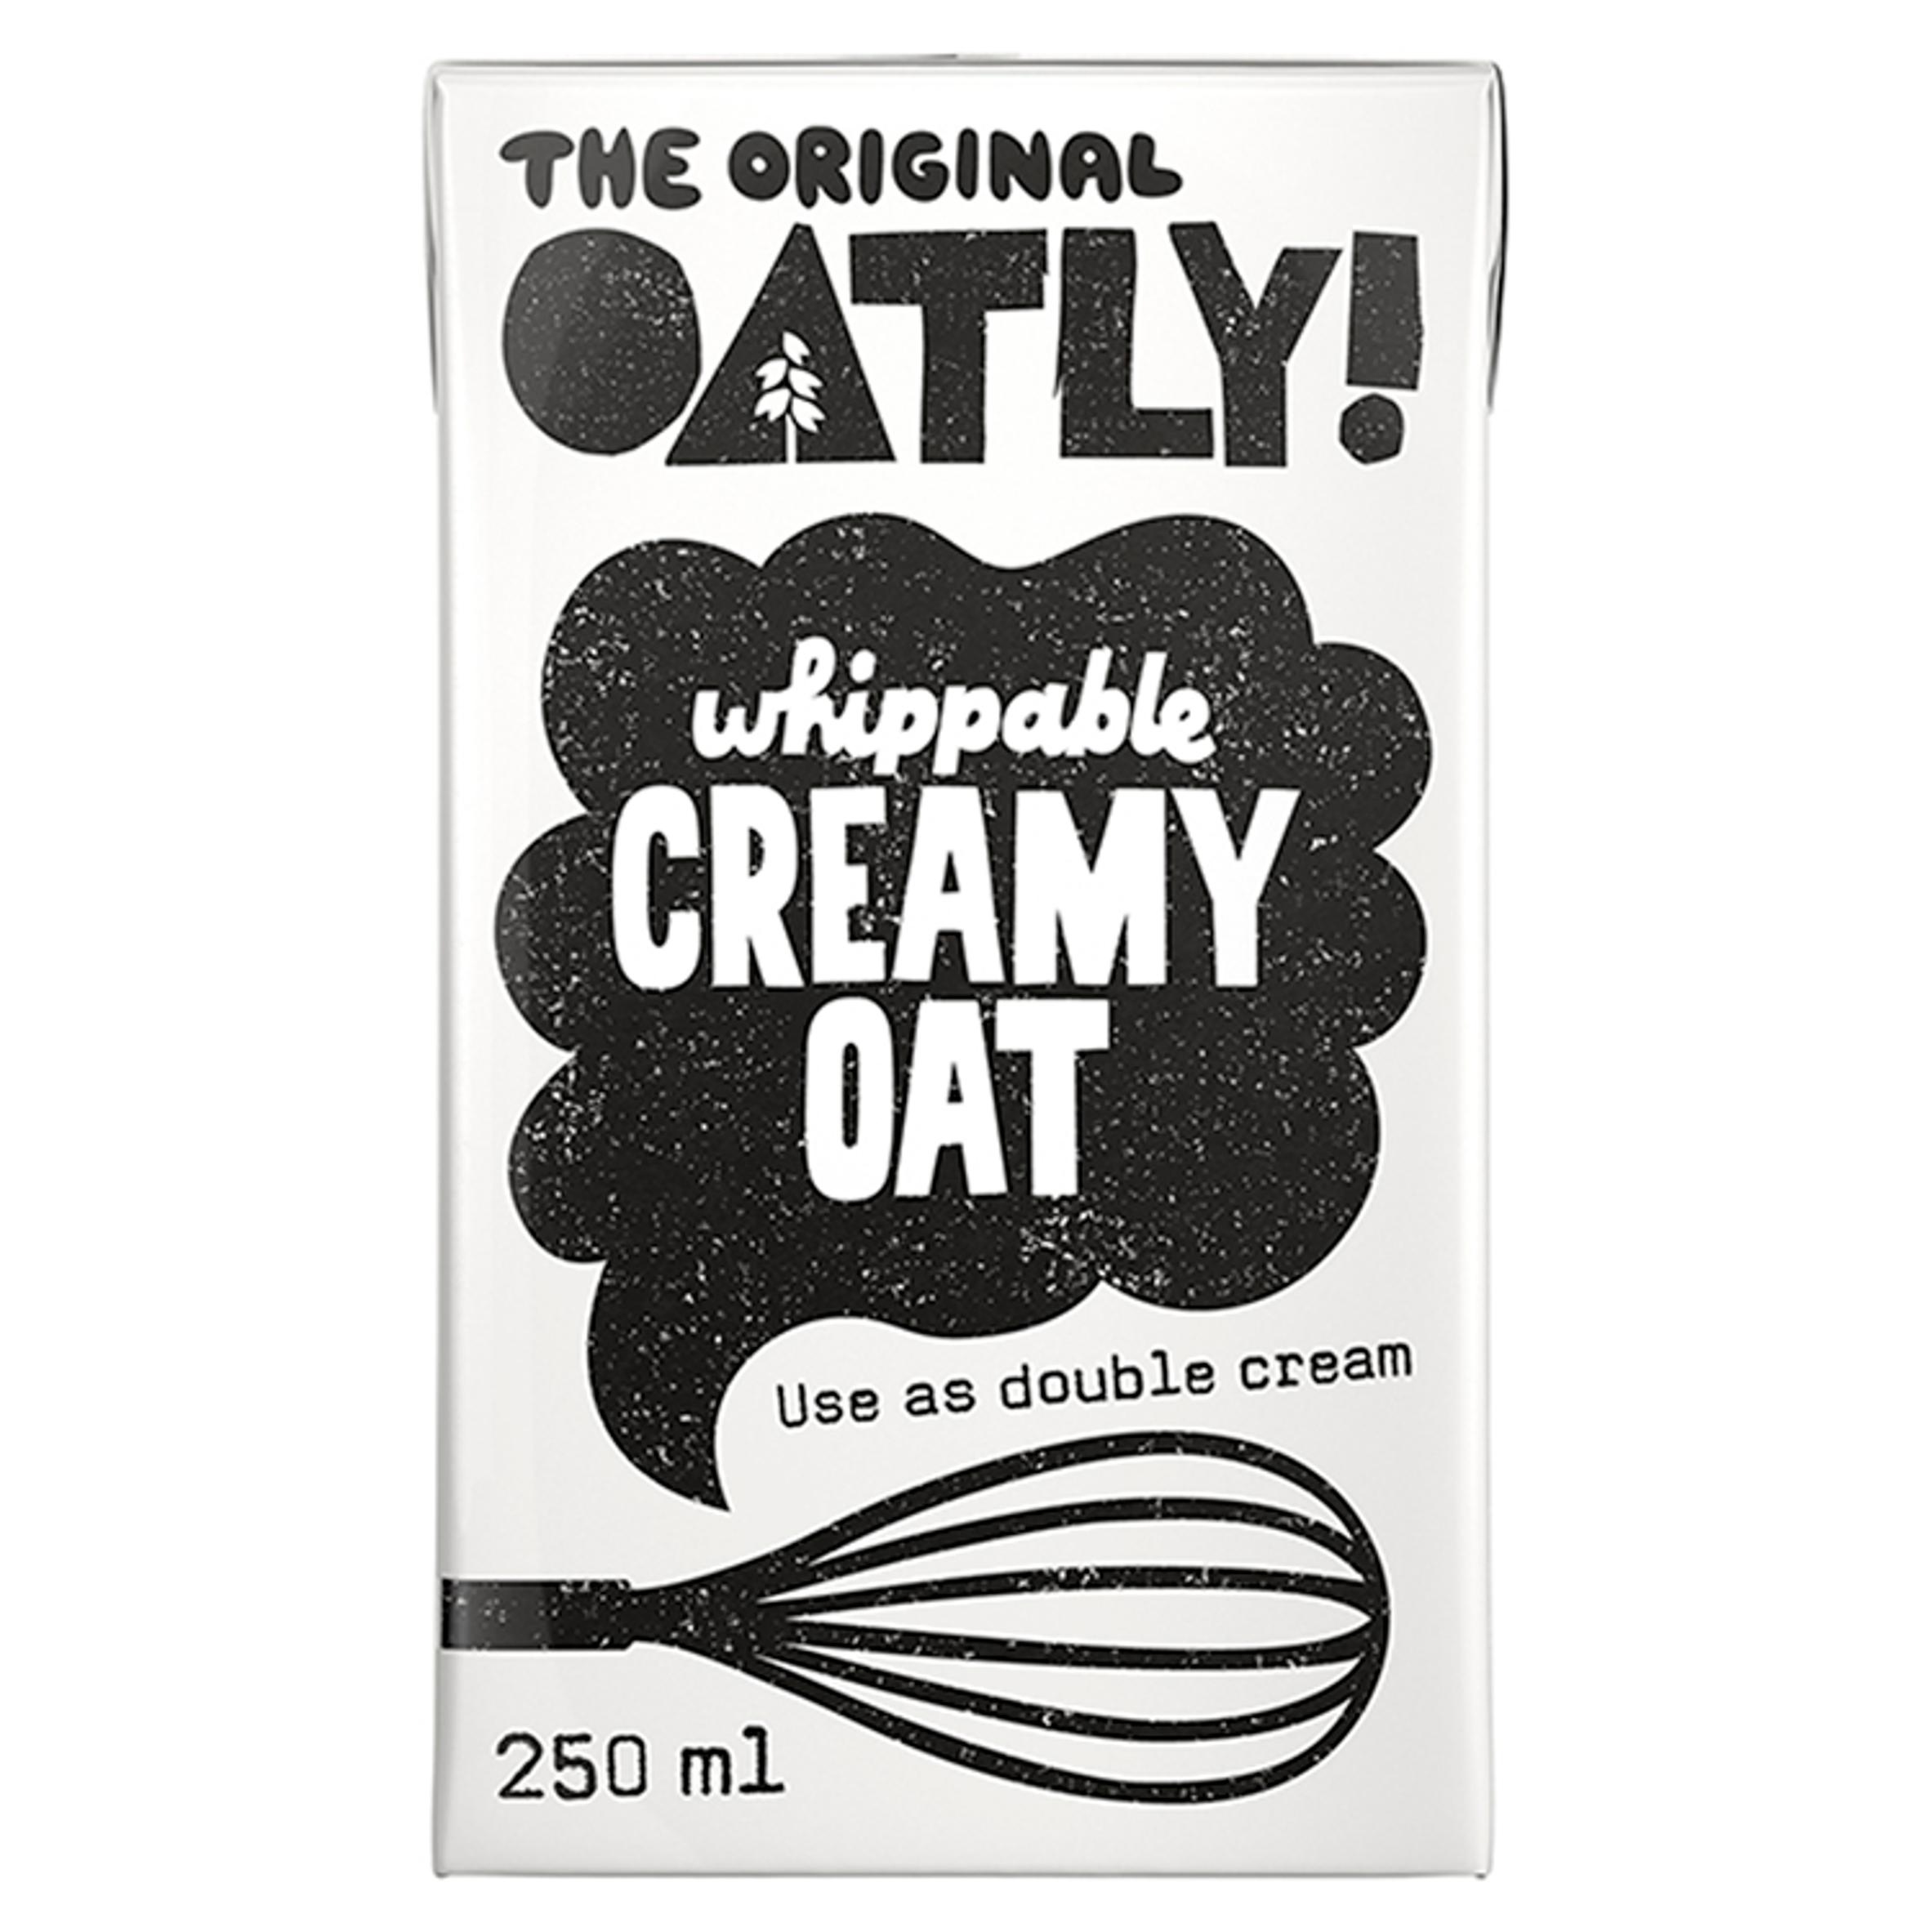 Oatly Whippable Creamy Oat 250Ml